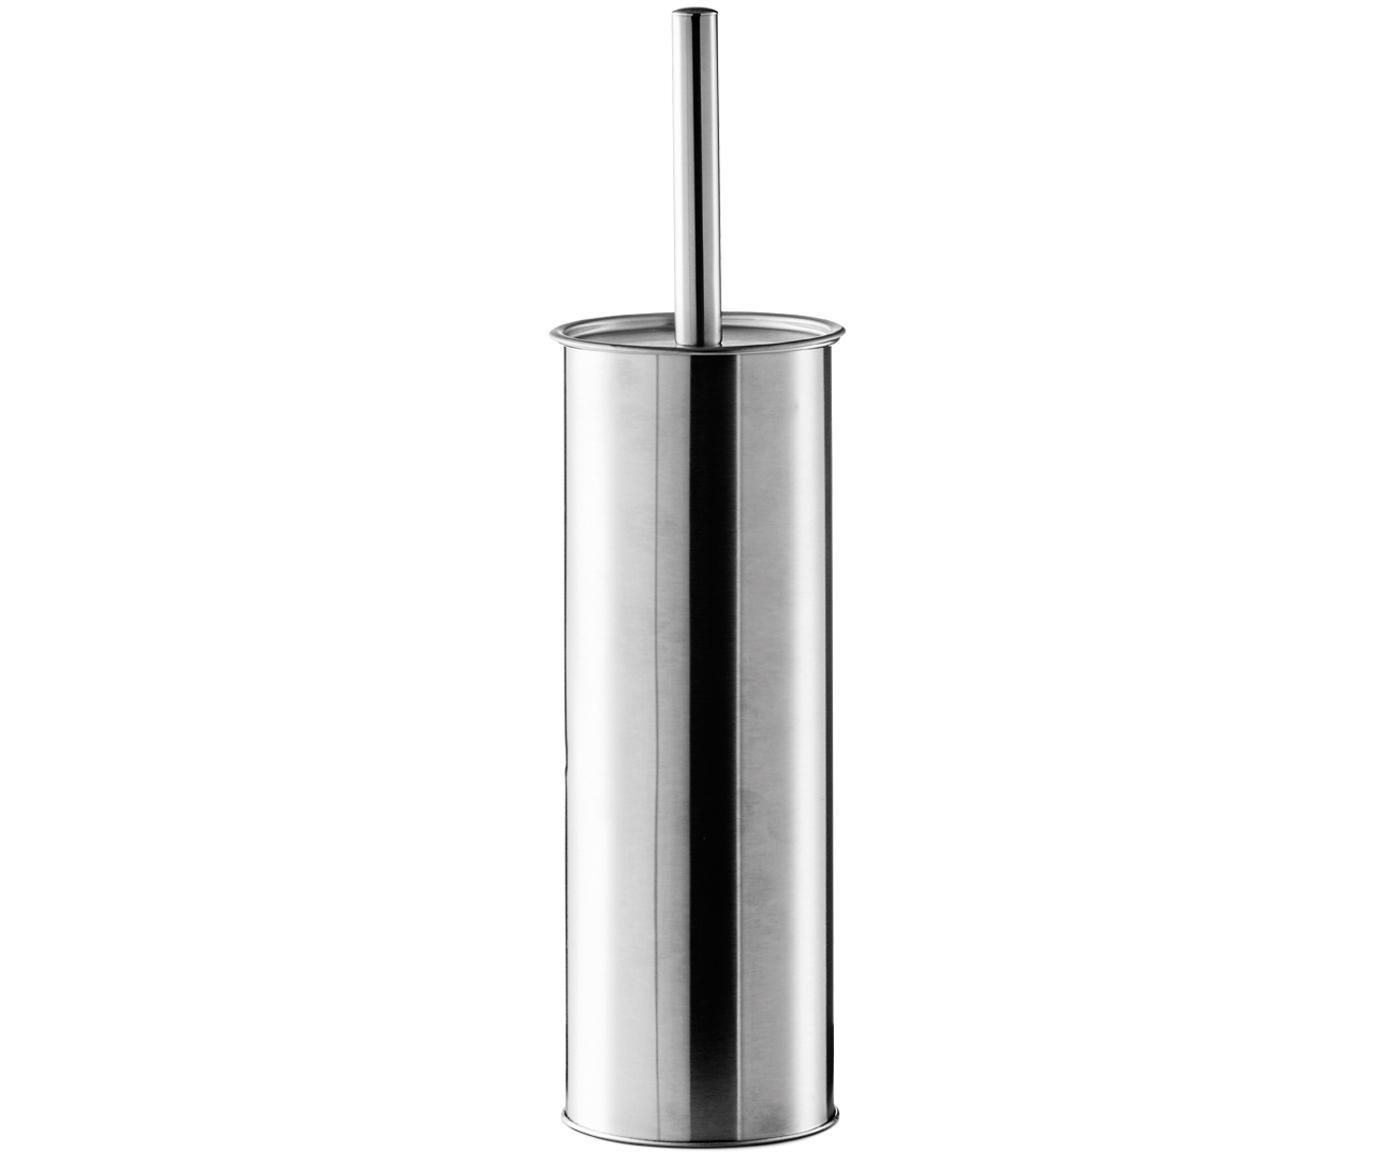 Toilettenbürste Classic mit Edelstahl-Behälter, Griff: Edelstahl, Edelstahl, Ø 10 x H 38 cm